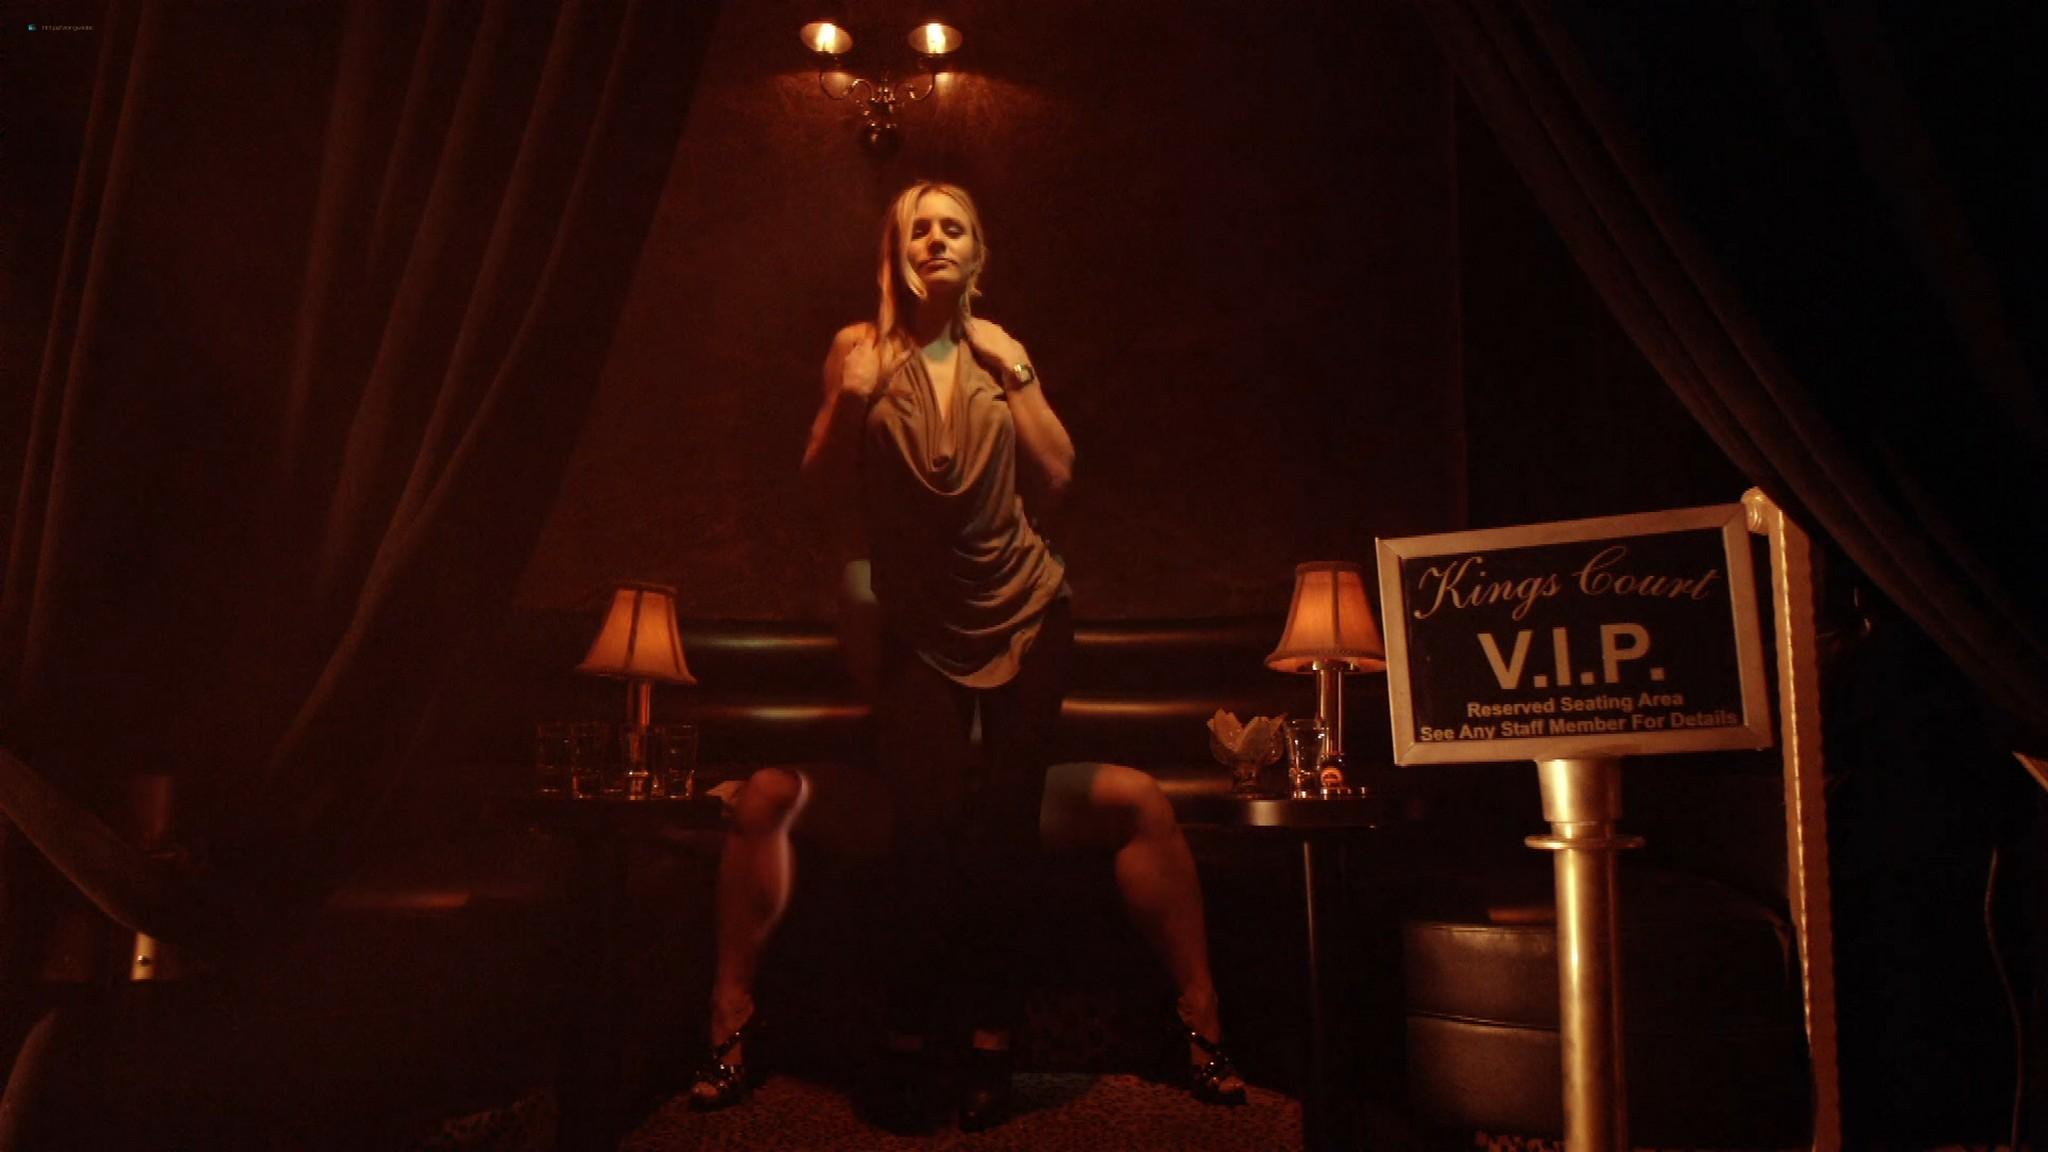 Kristen Bell hot Dawn Olivieri Megalyn Echikunwoke nude topless House Of Lies 2012 s1e1 1080p Web 14